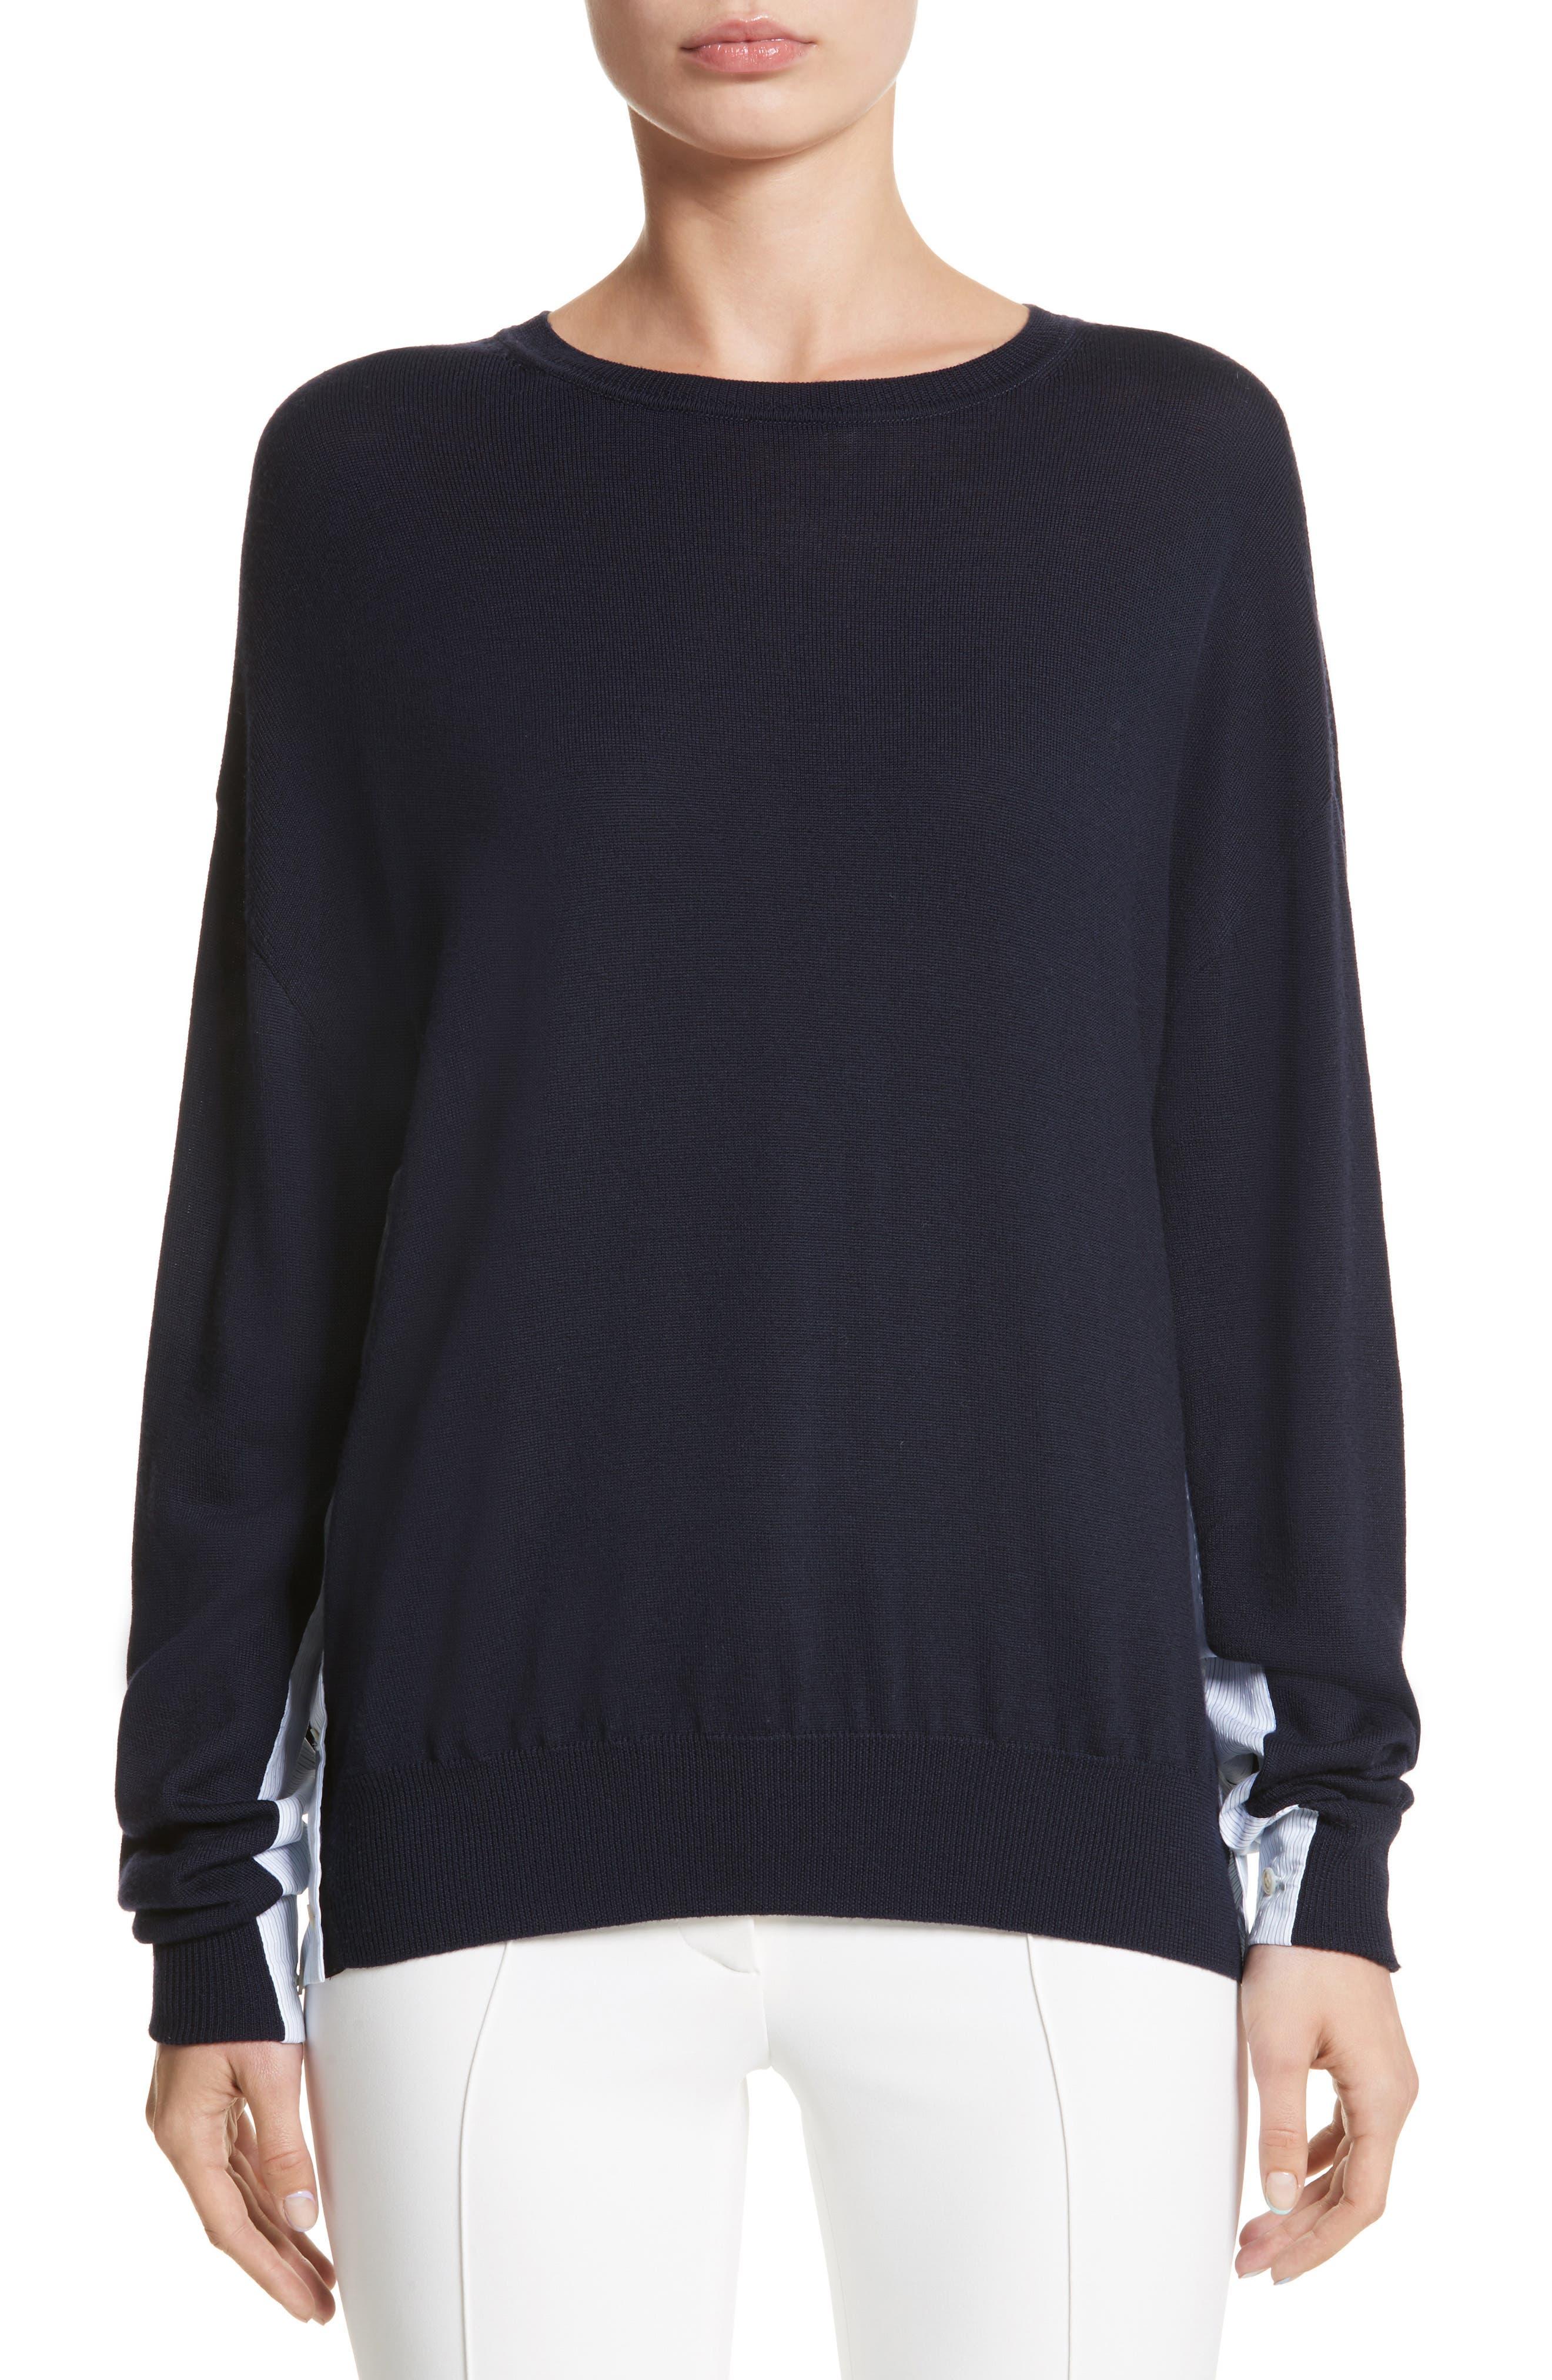 Main Image - Adam Lippes Cotton Gusset Merino Wool Sweater